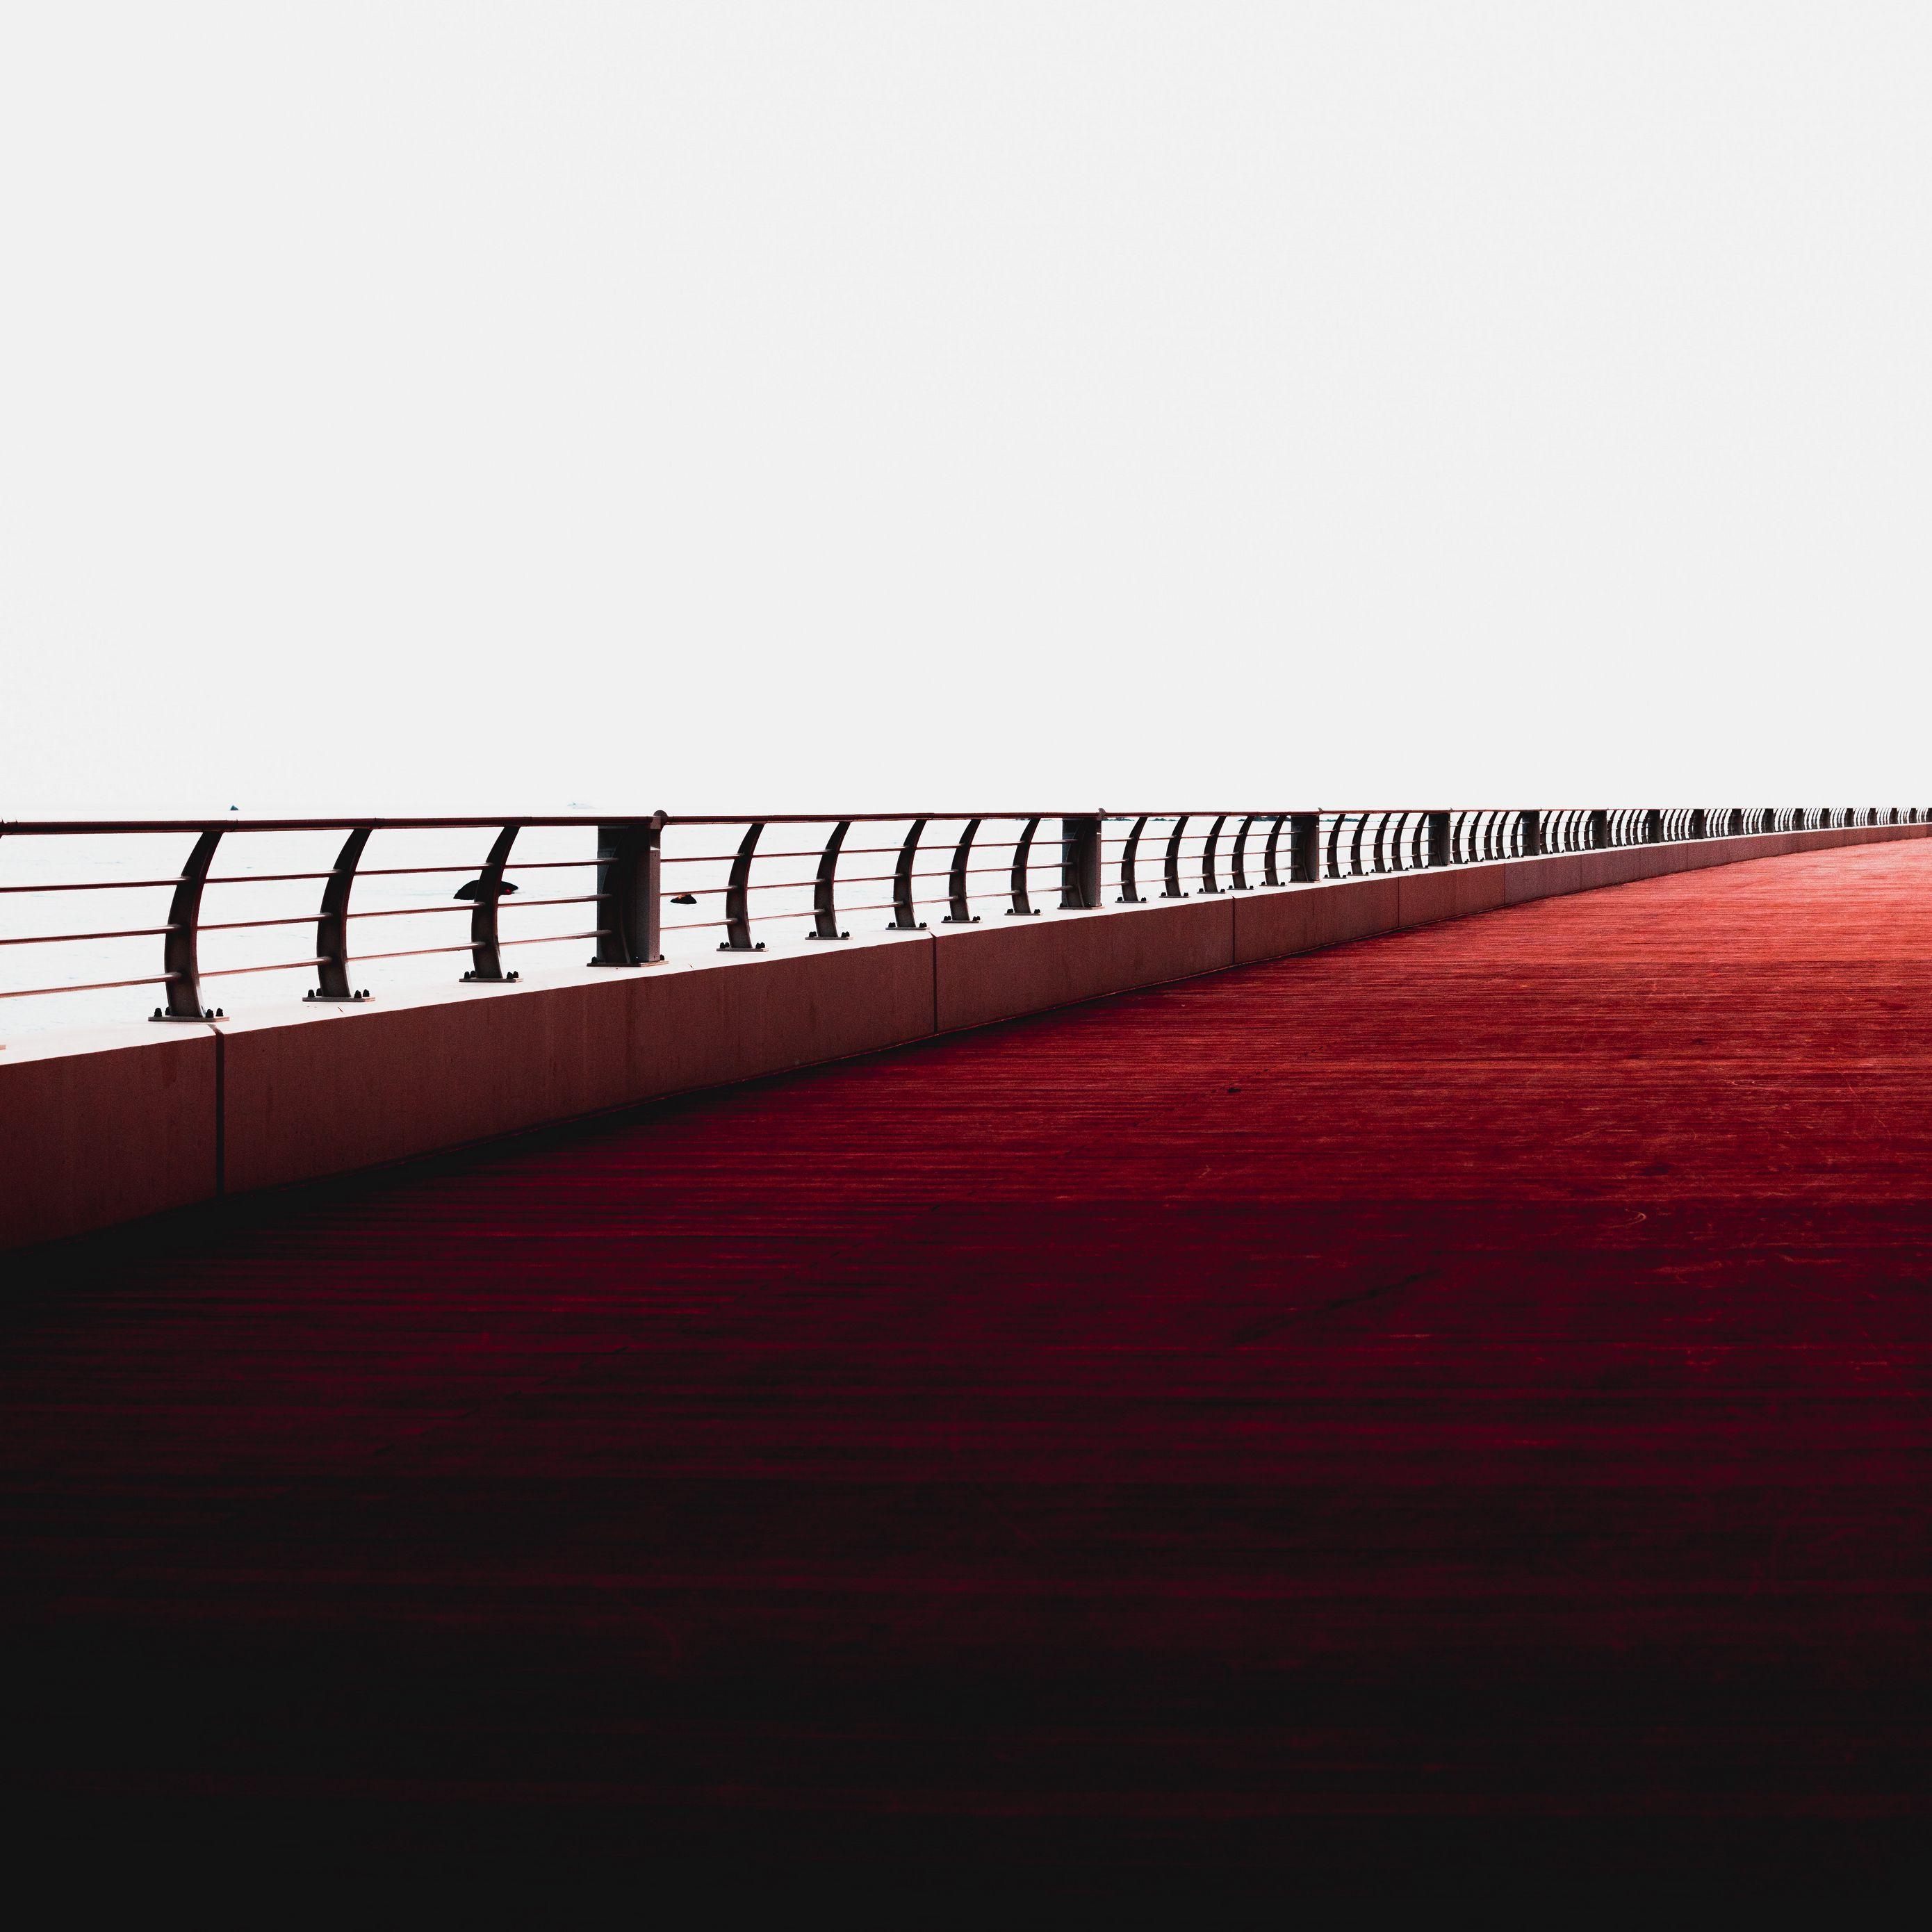 2780x2780 Wallpaper bridge, minimalism, railing, dubai, united arab emirates